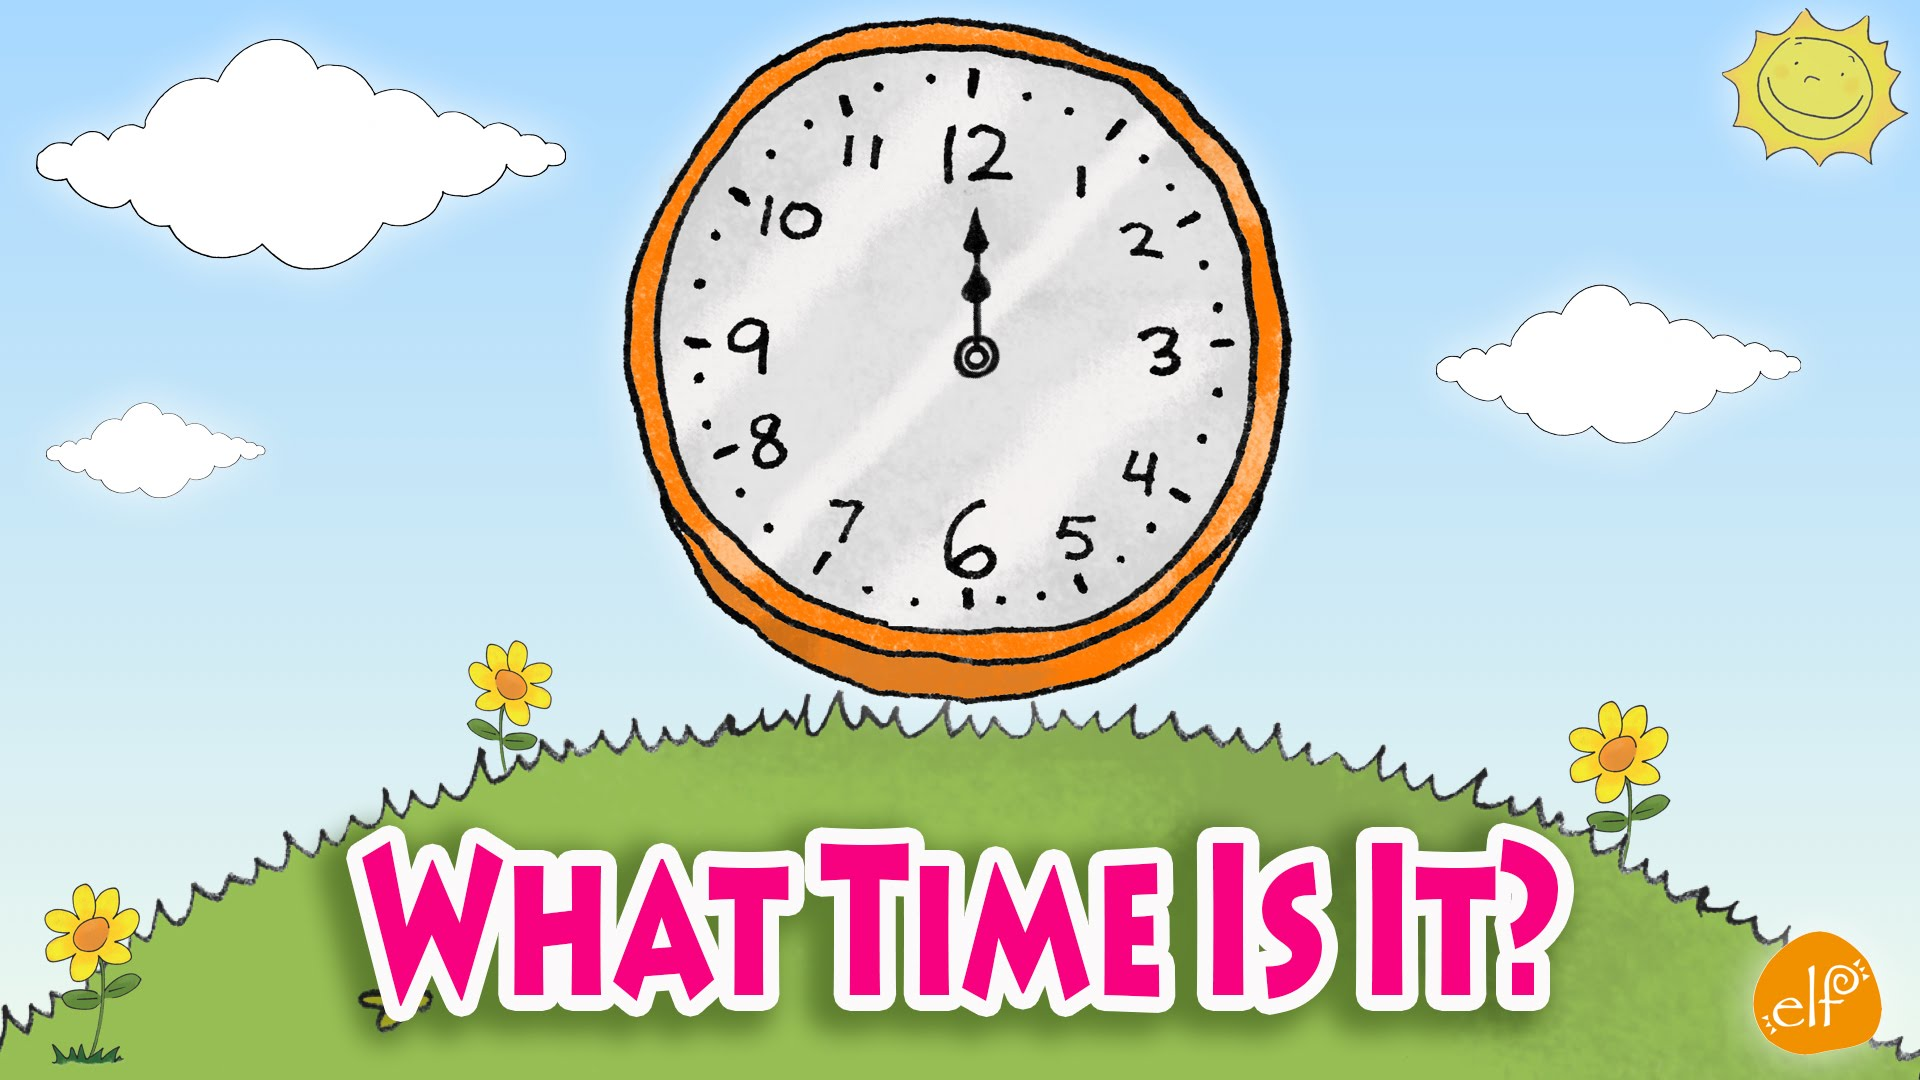 Tick Tock Time!